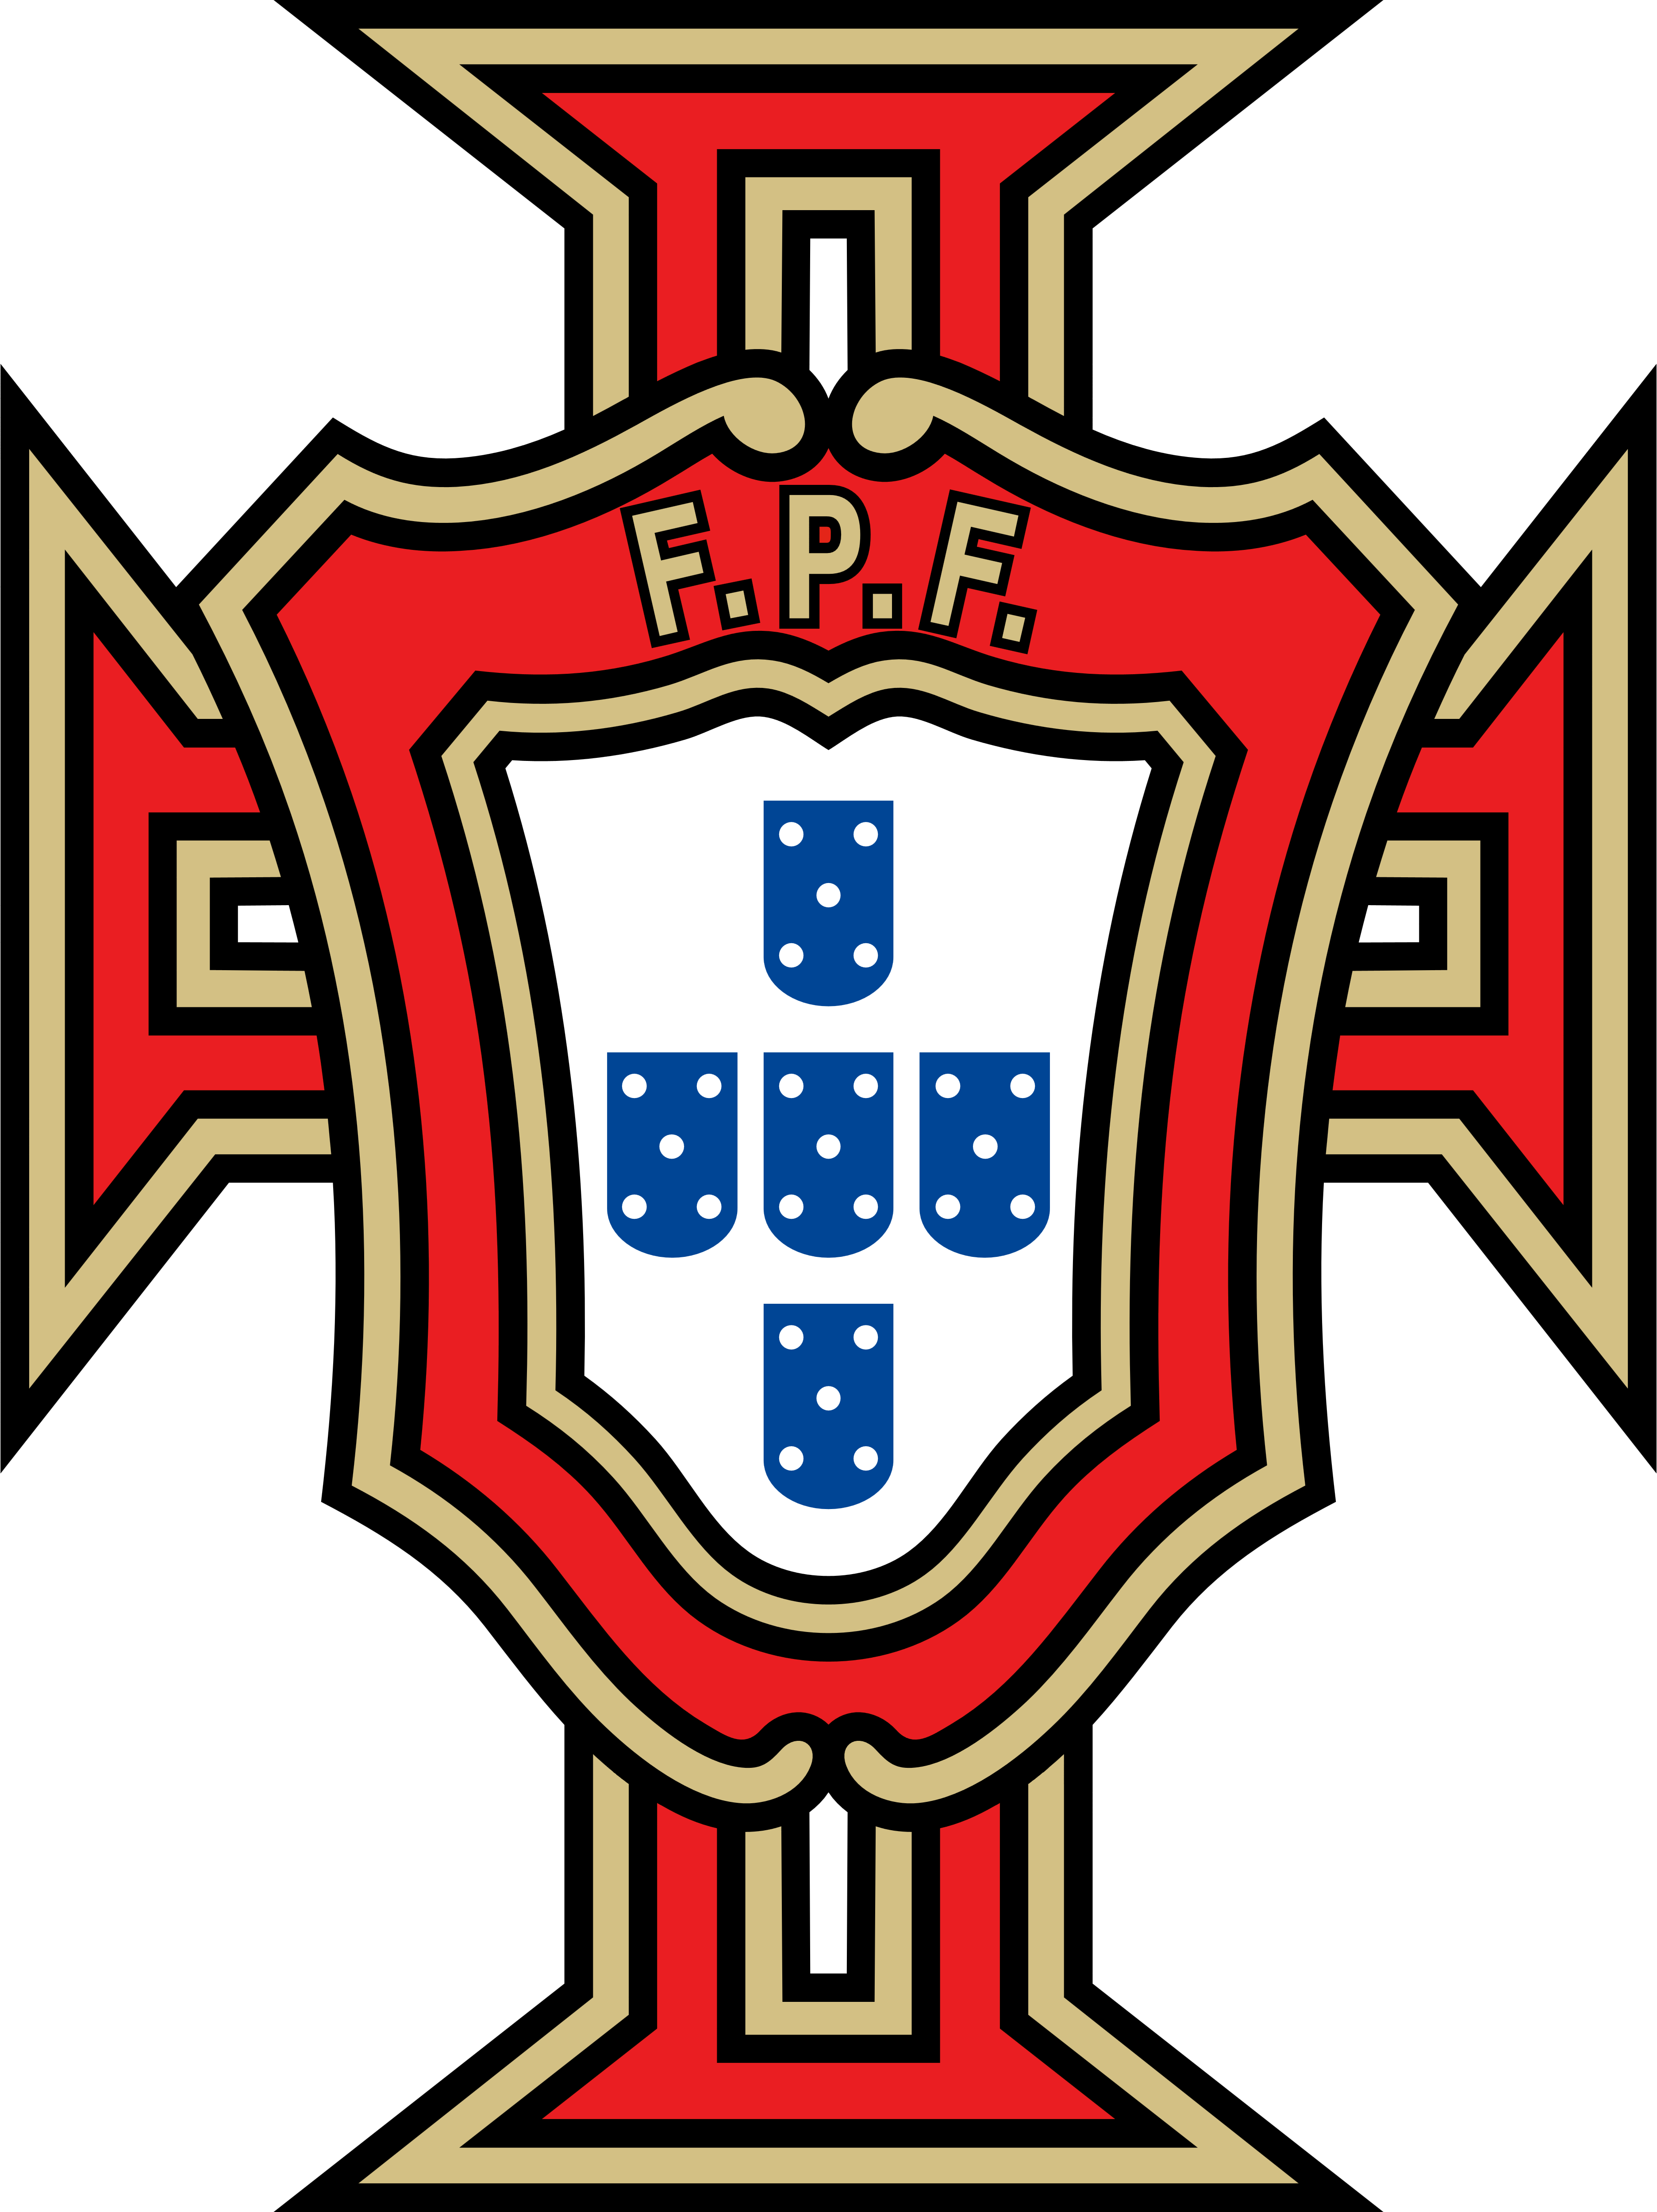 Portugal national football team.